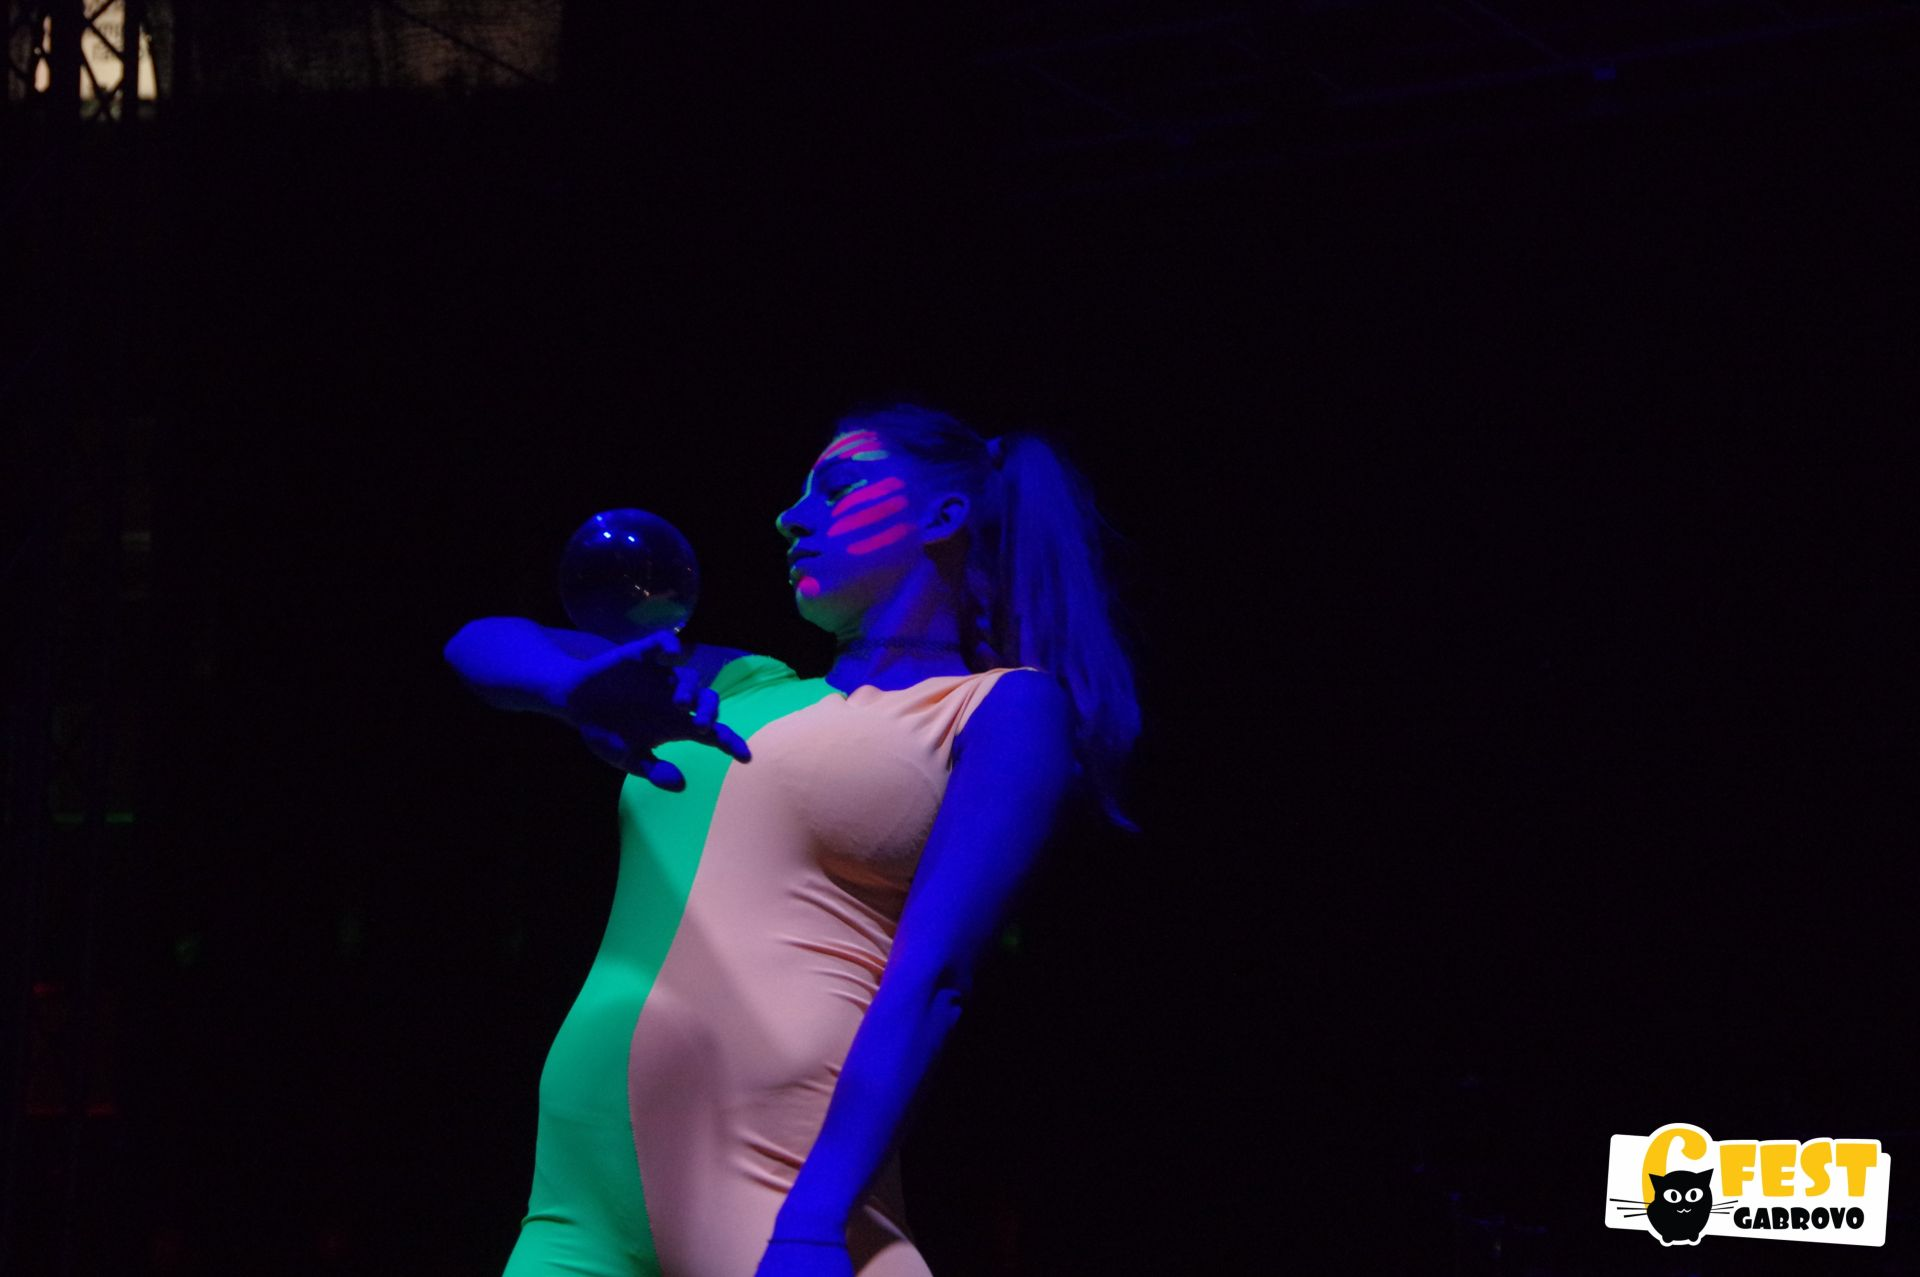 """Цирк де ла Люлин"", светлинно шоу ""Light It Up"", 20 май 2017 © 6Fest Габрово"